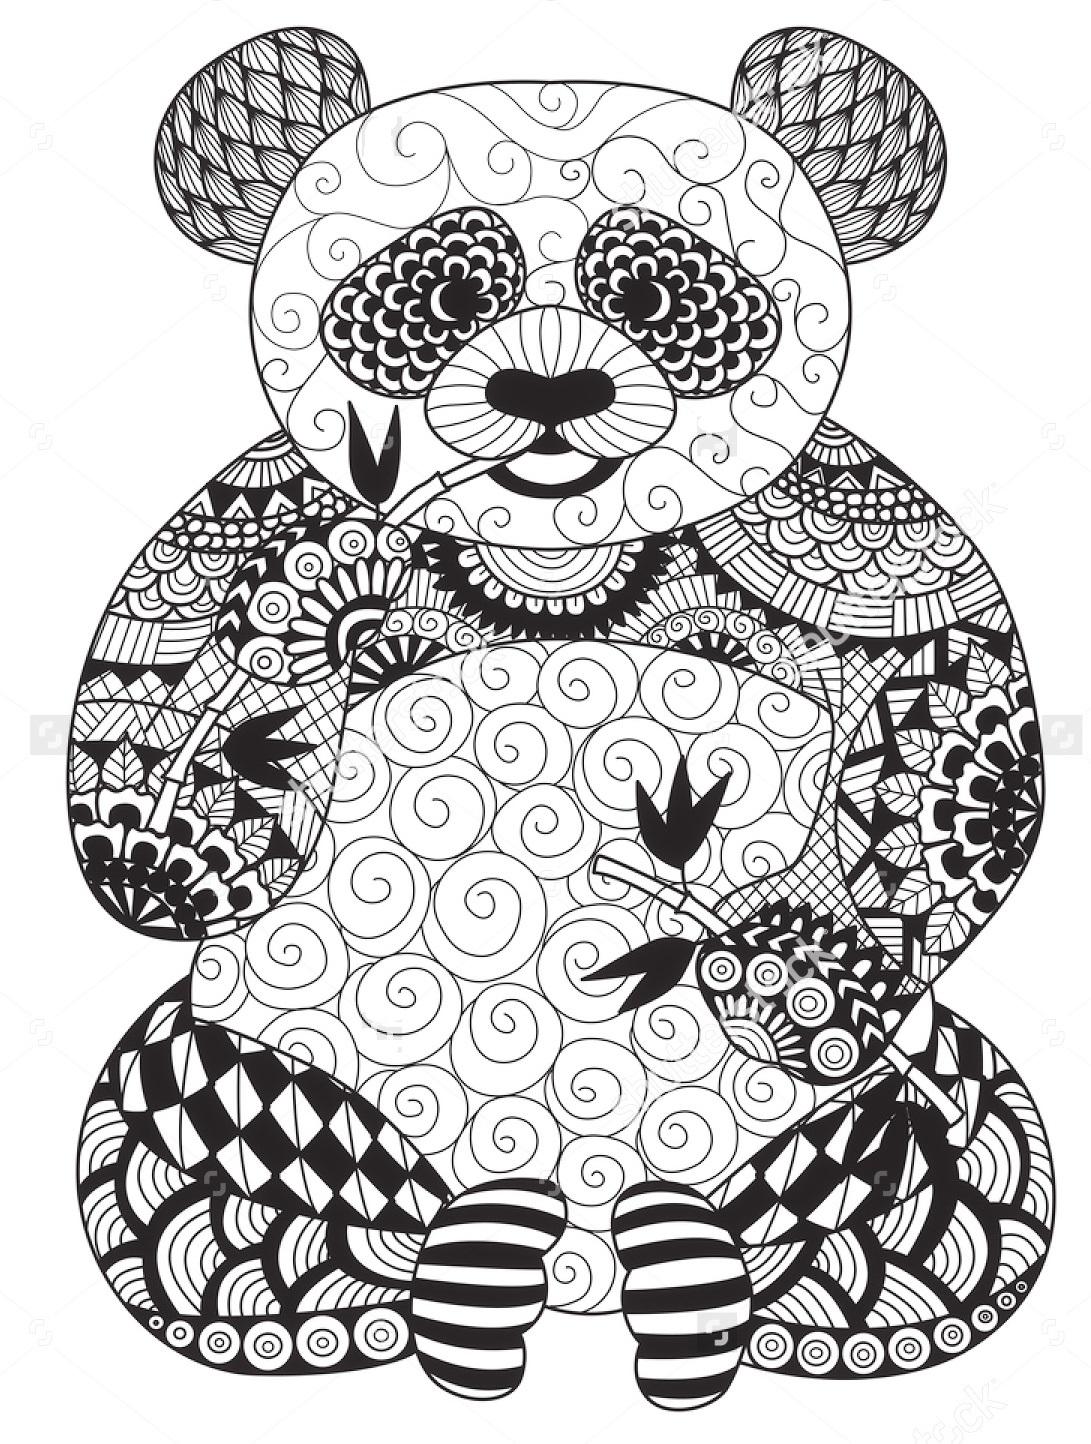 vector-zentangle-panda-coloring-page